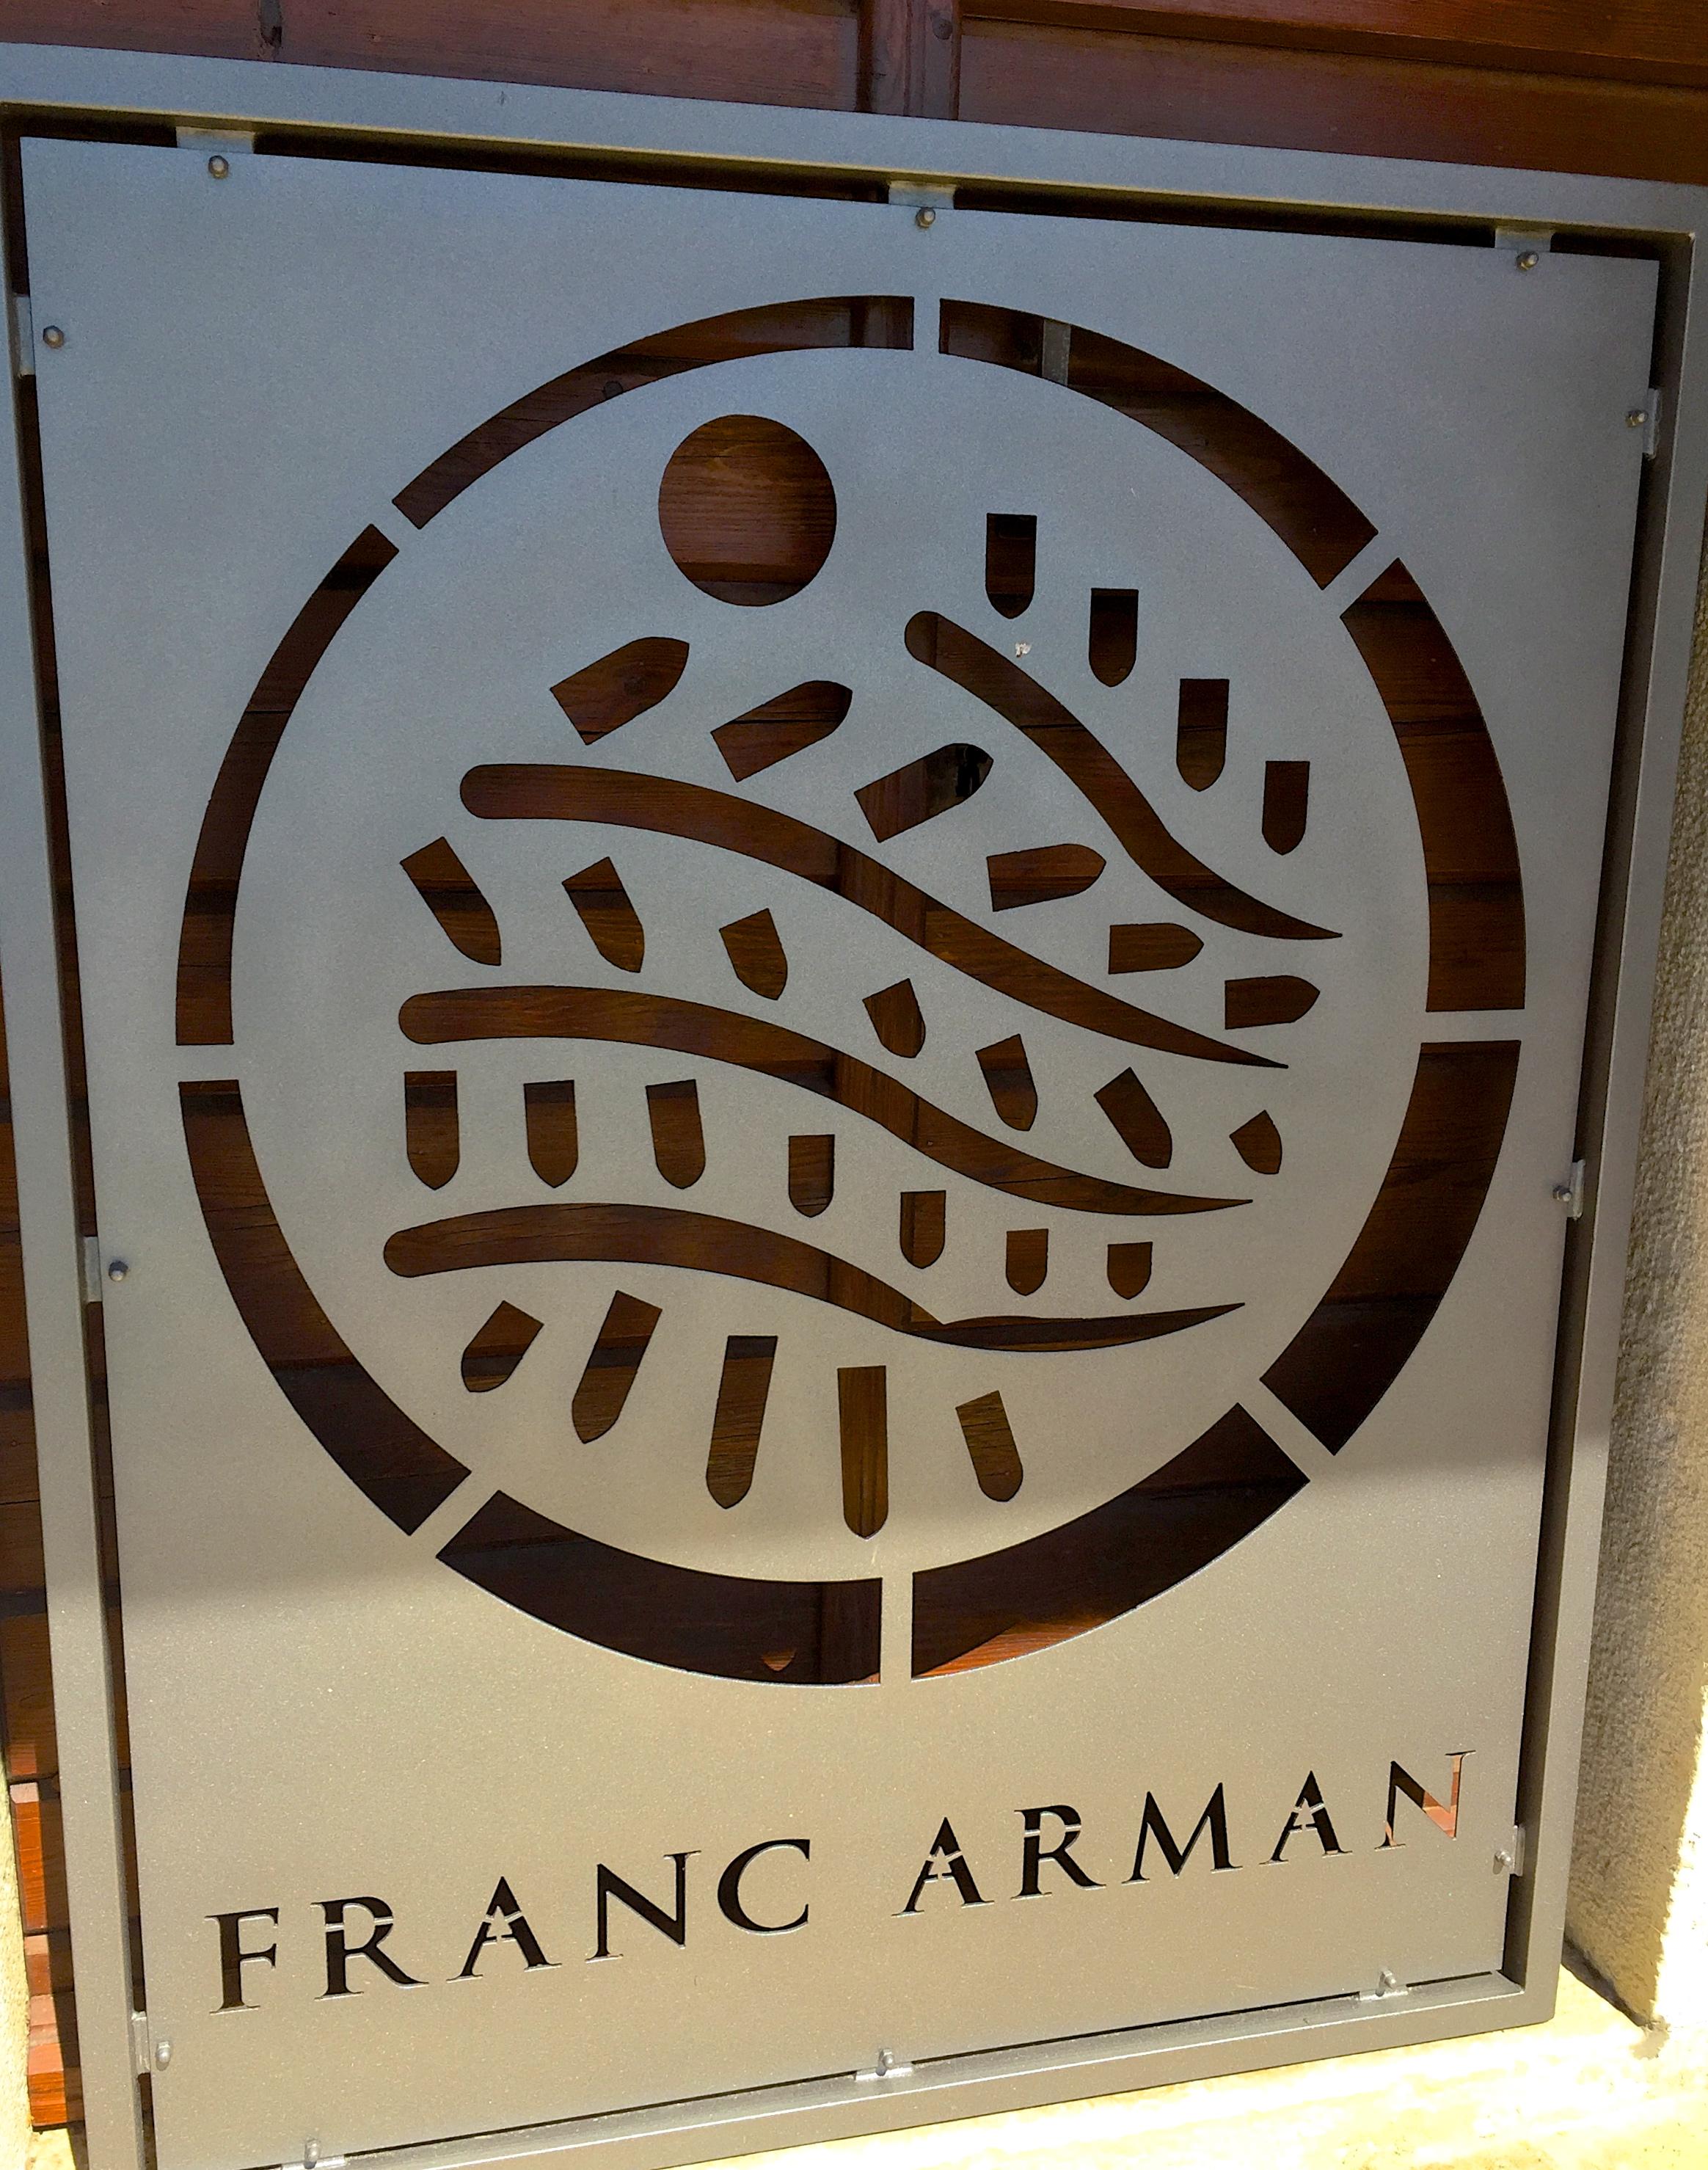 Franc Arman